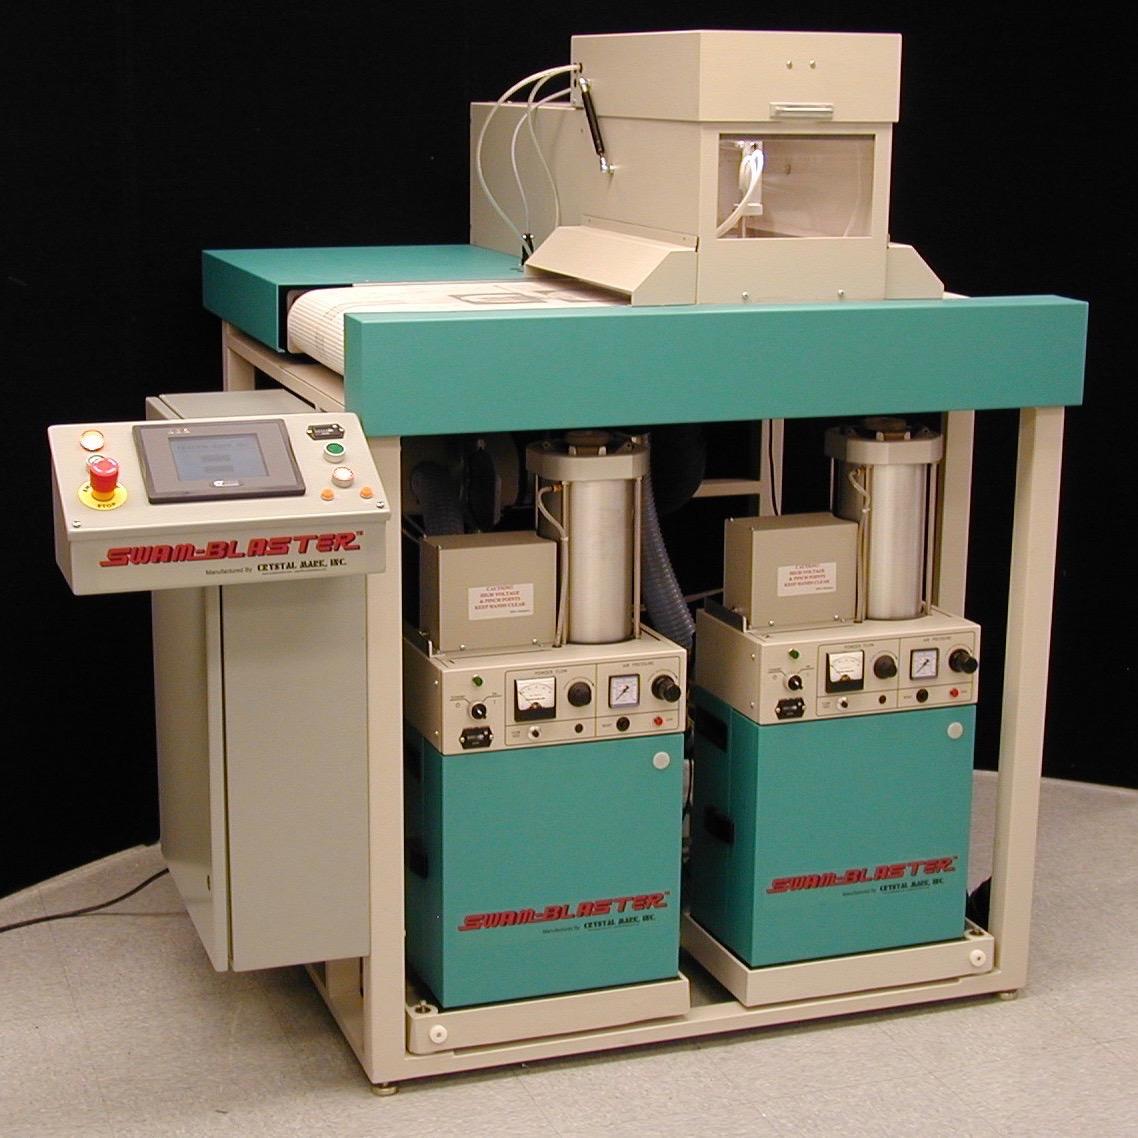 C129 Automated Belt Abrading System